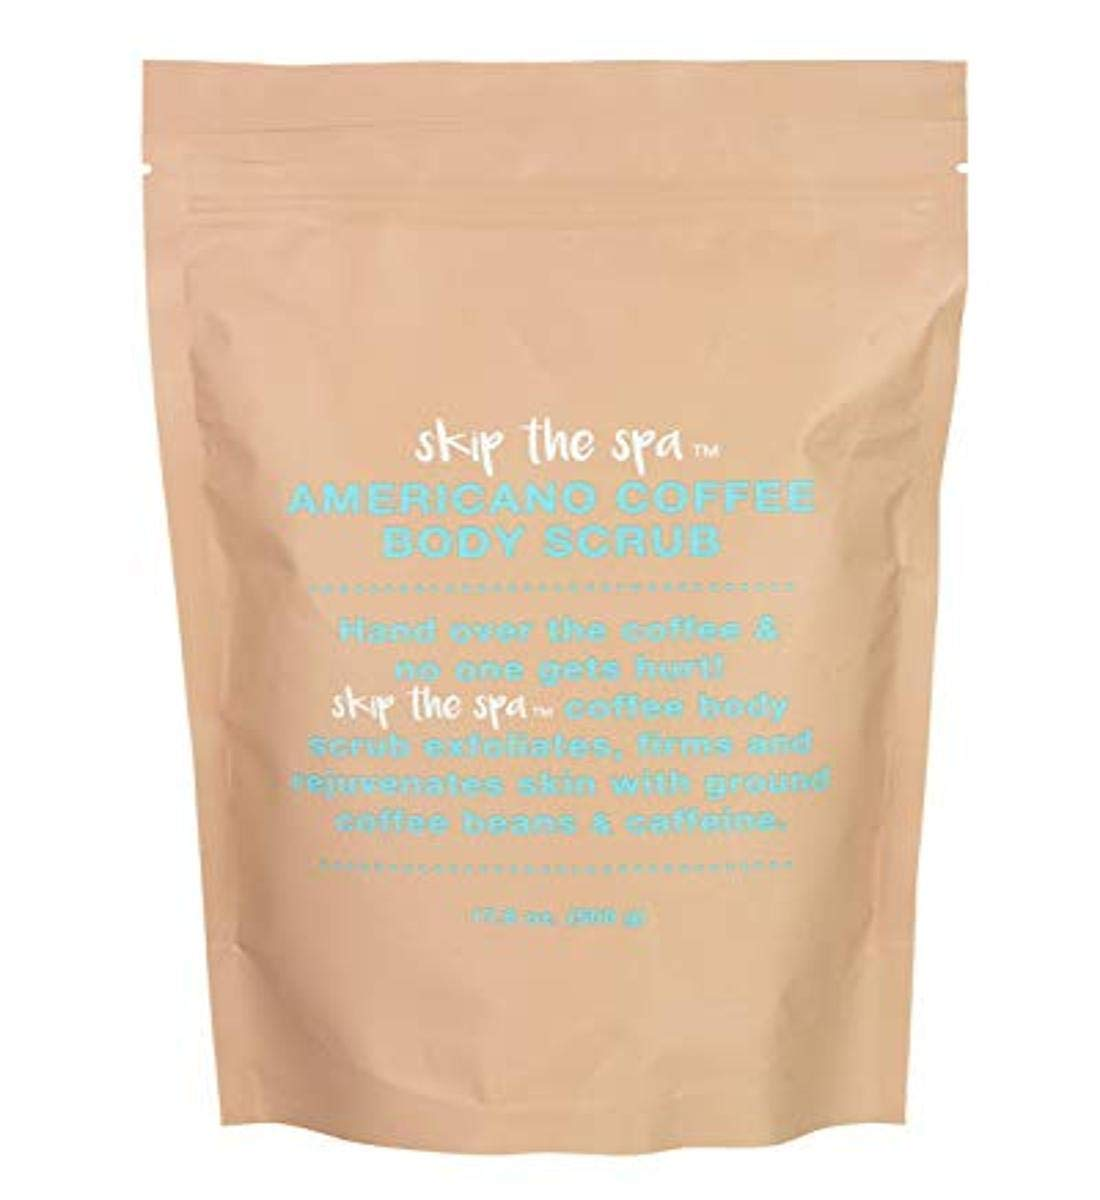 Jean low-pricing Pierre Cosmetics Coffee Body Americano Scrub Shipping included